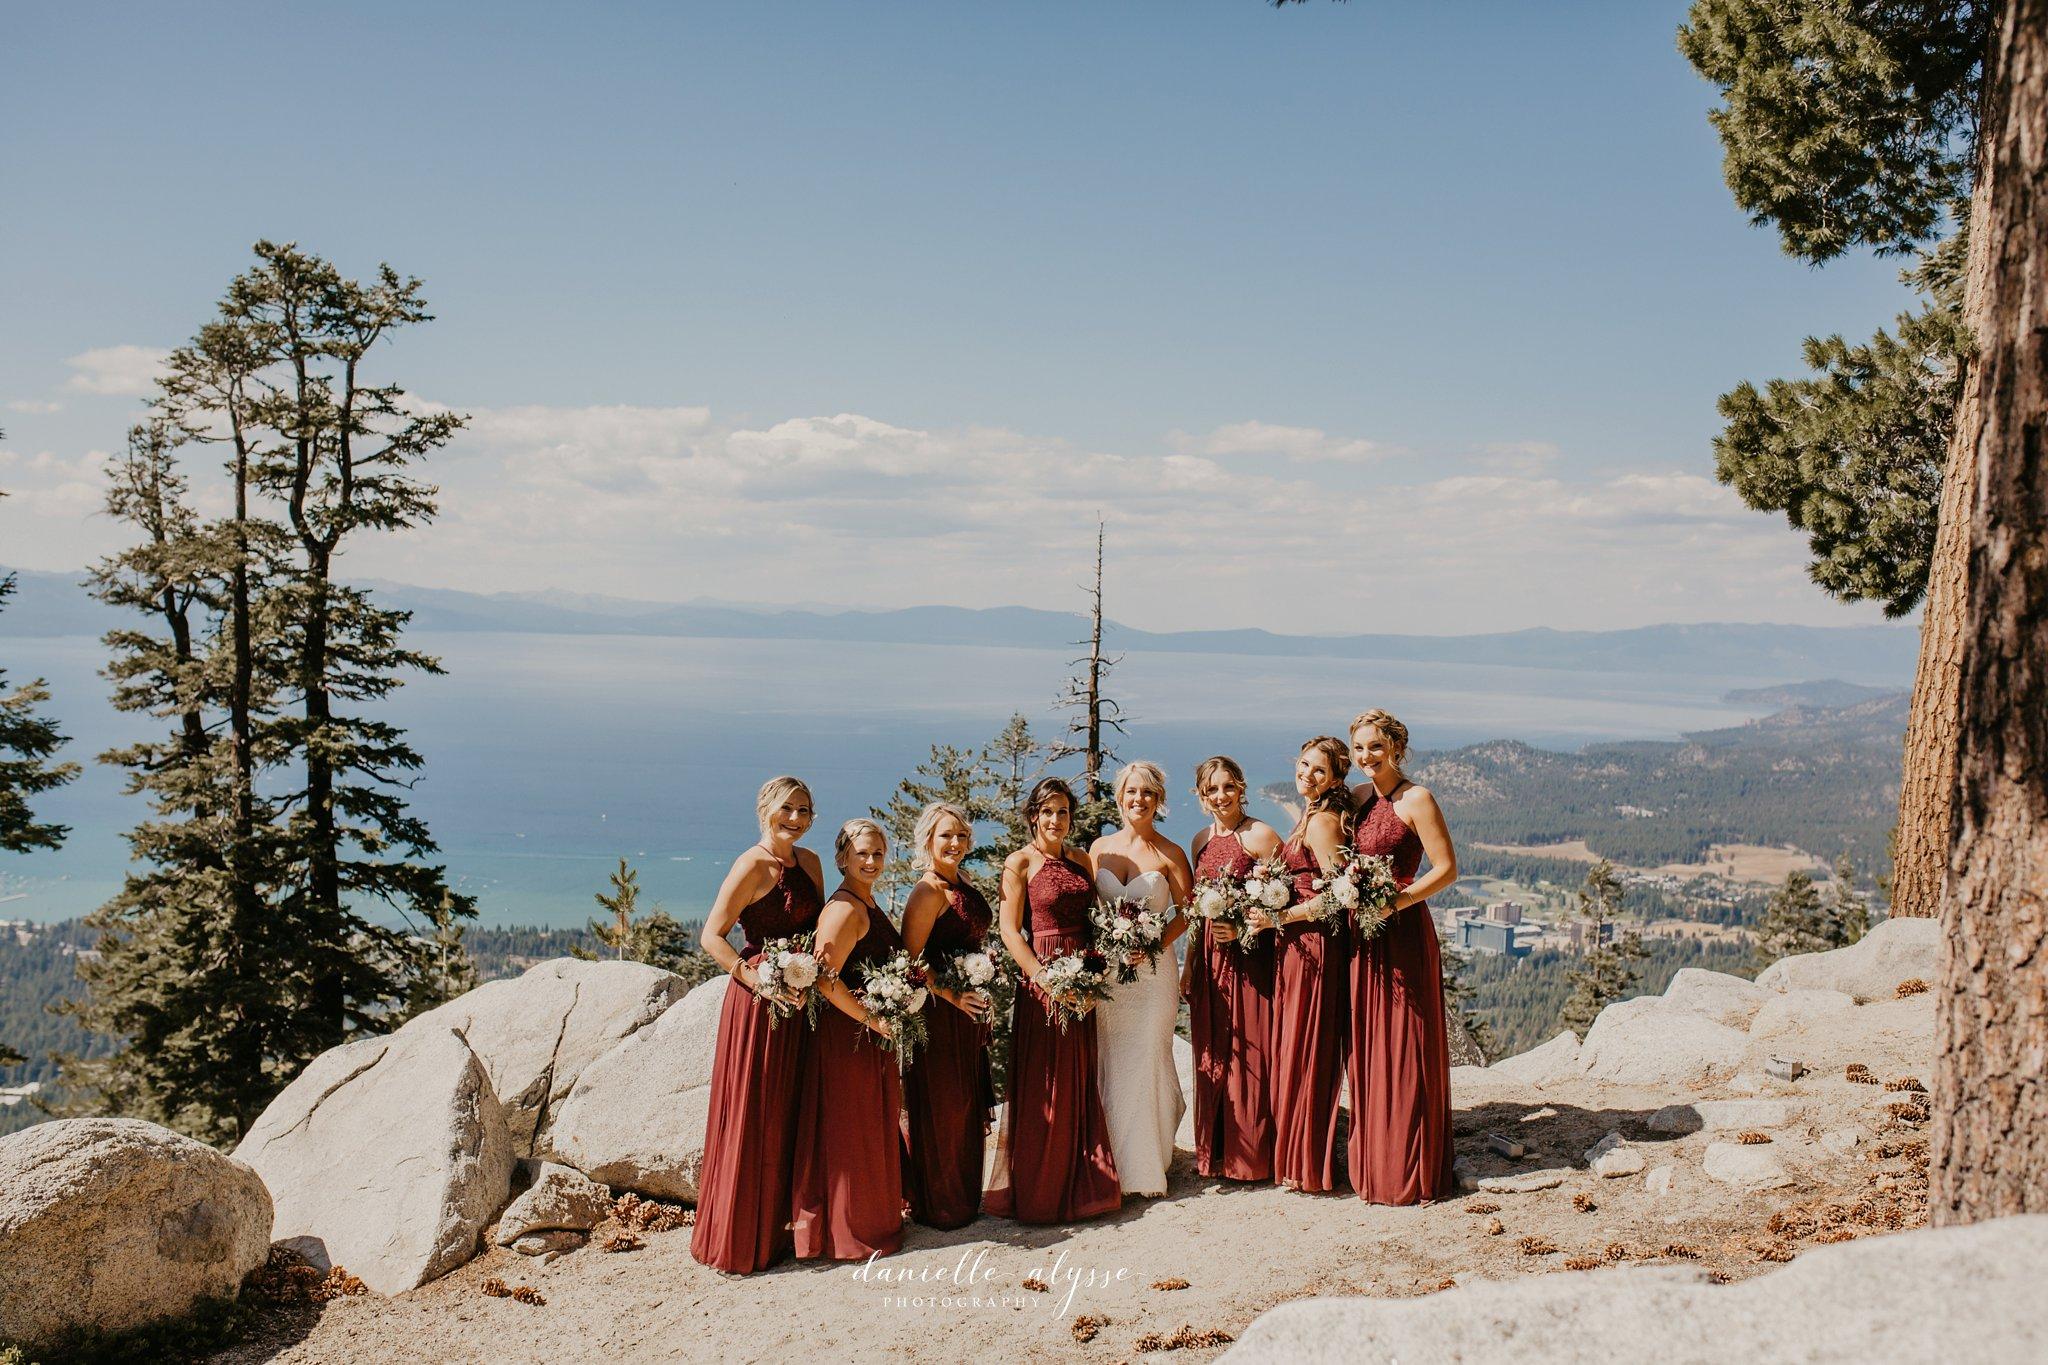 180831_wedding_stephanie_heavenly_south_lake_tahoe_danielle_alysse_photography_destination_blog_280_WEB.jpg